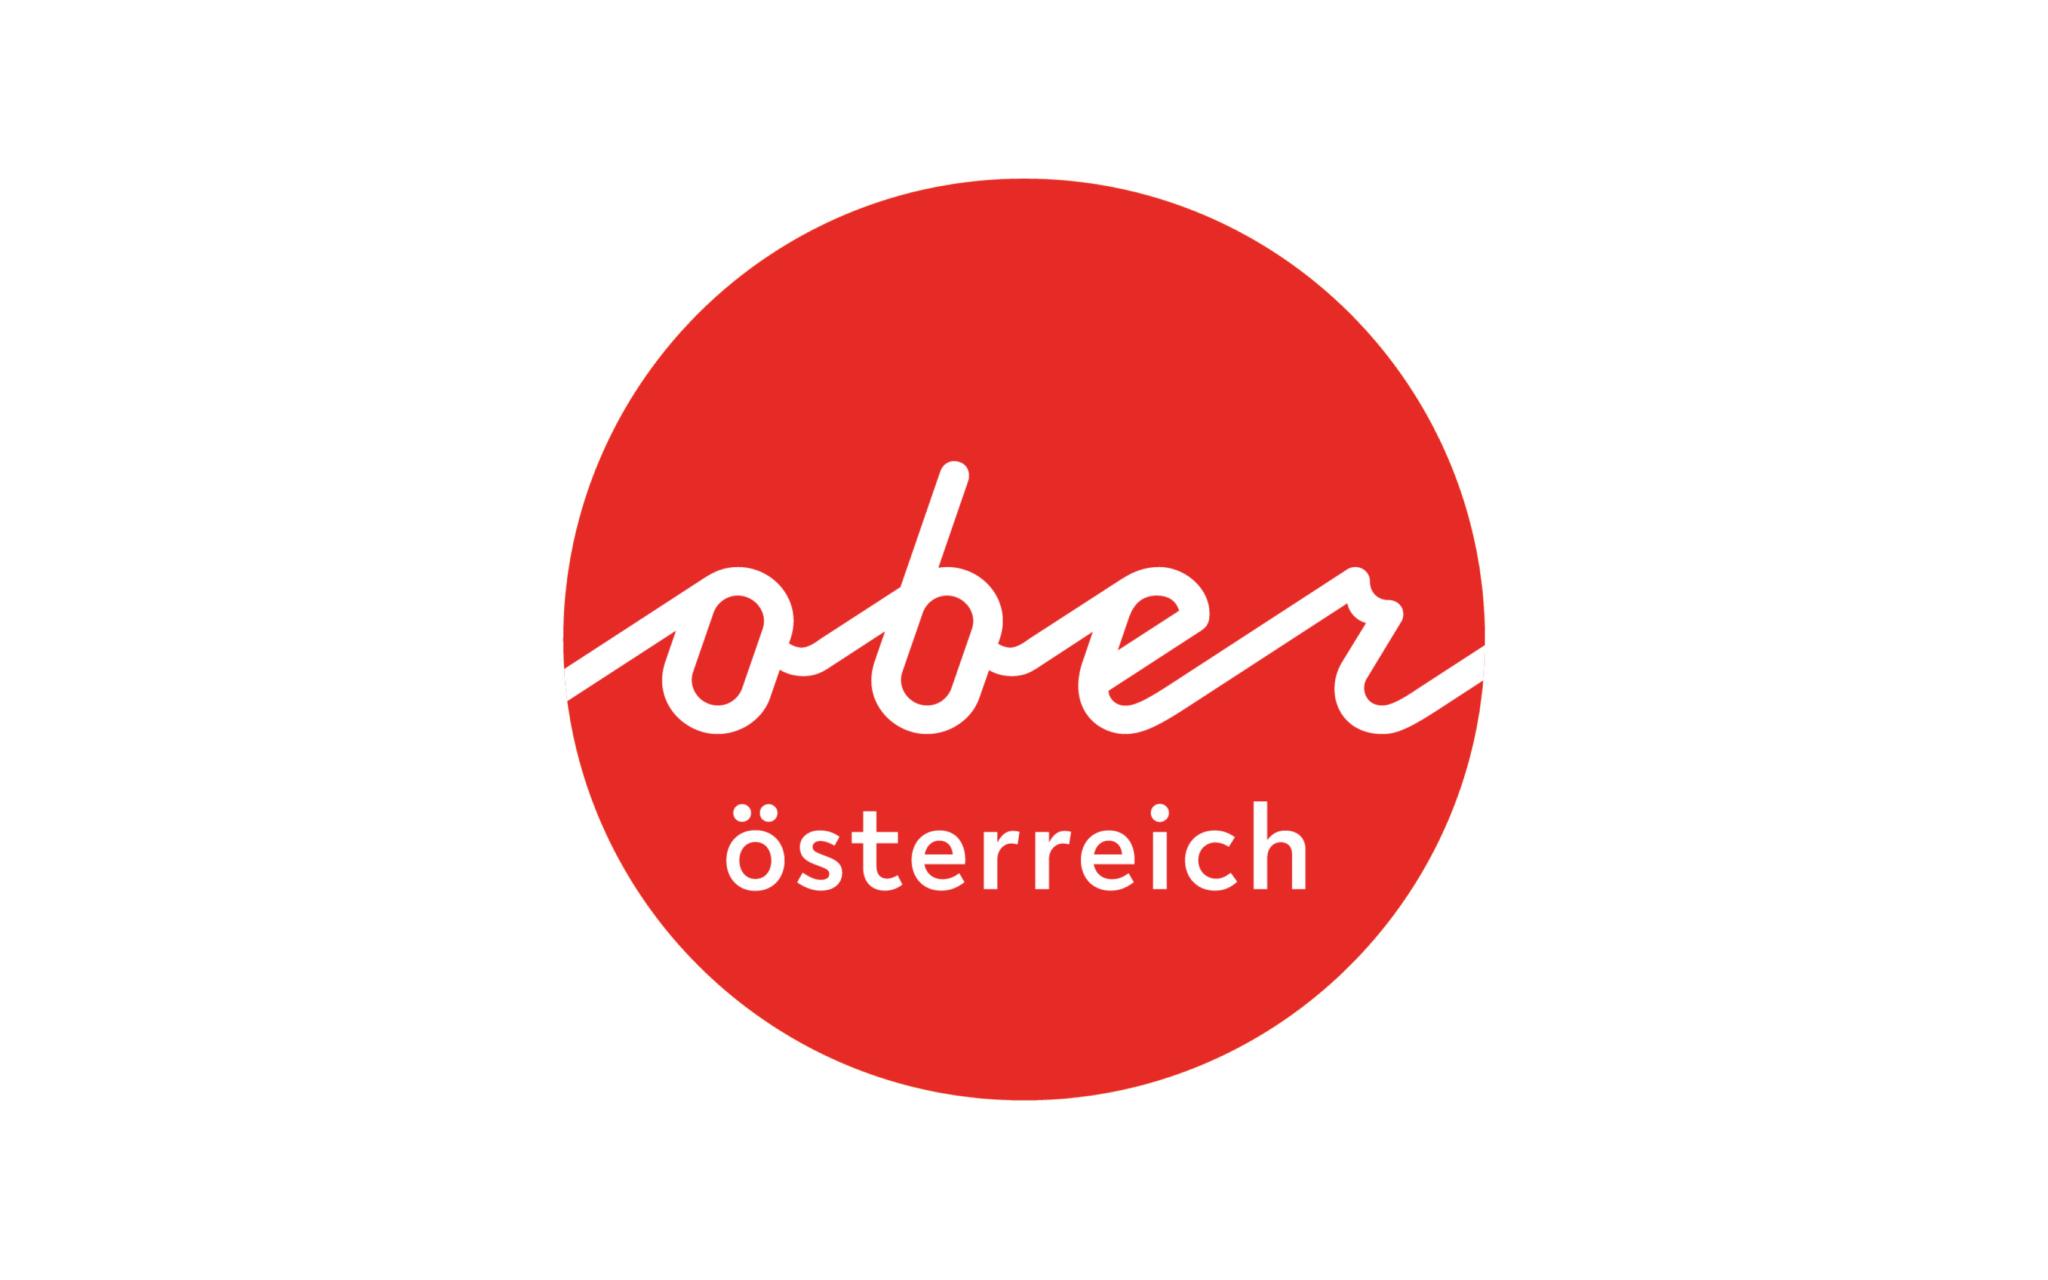 Logo des Landes Oberösterreich